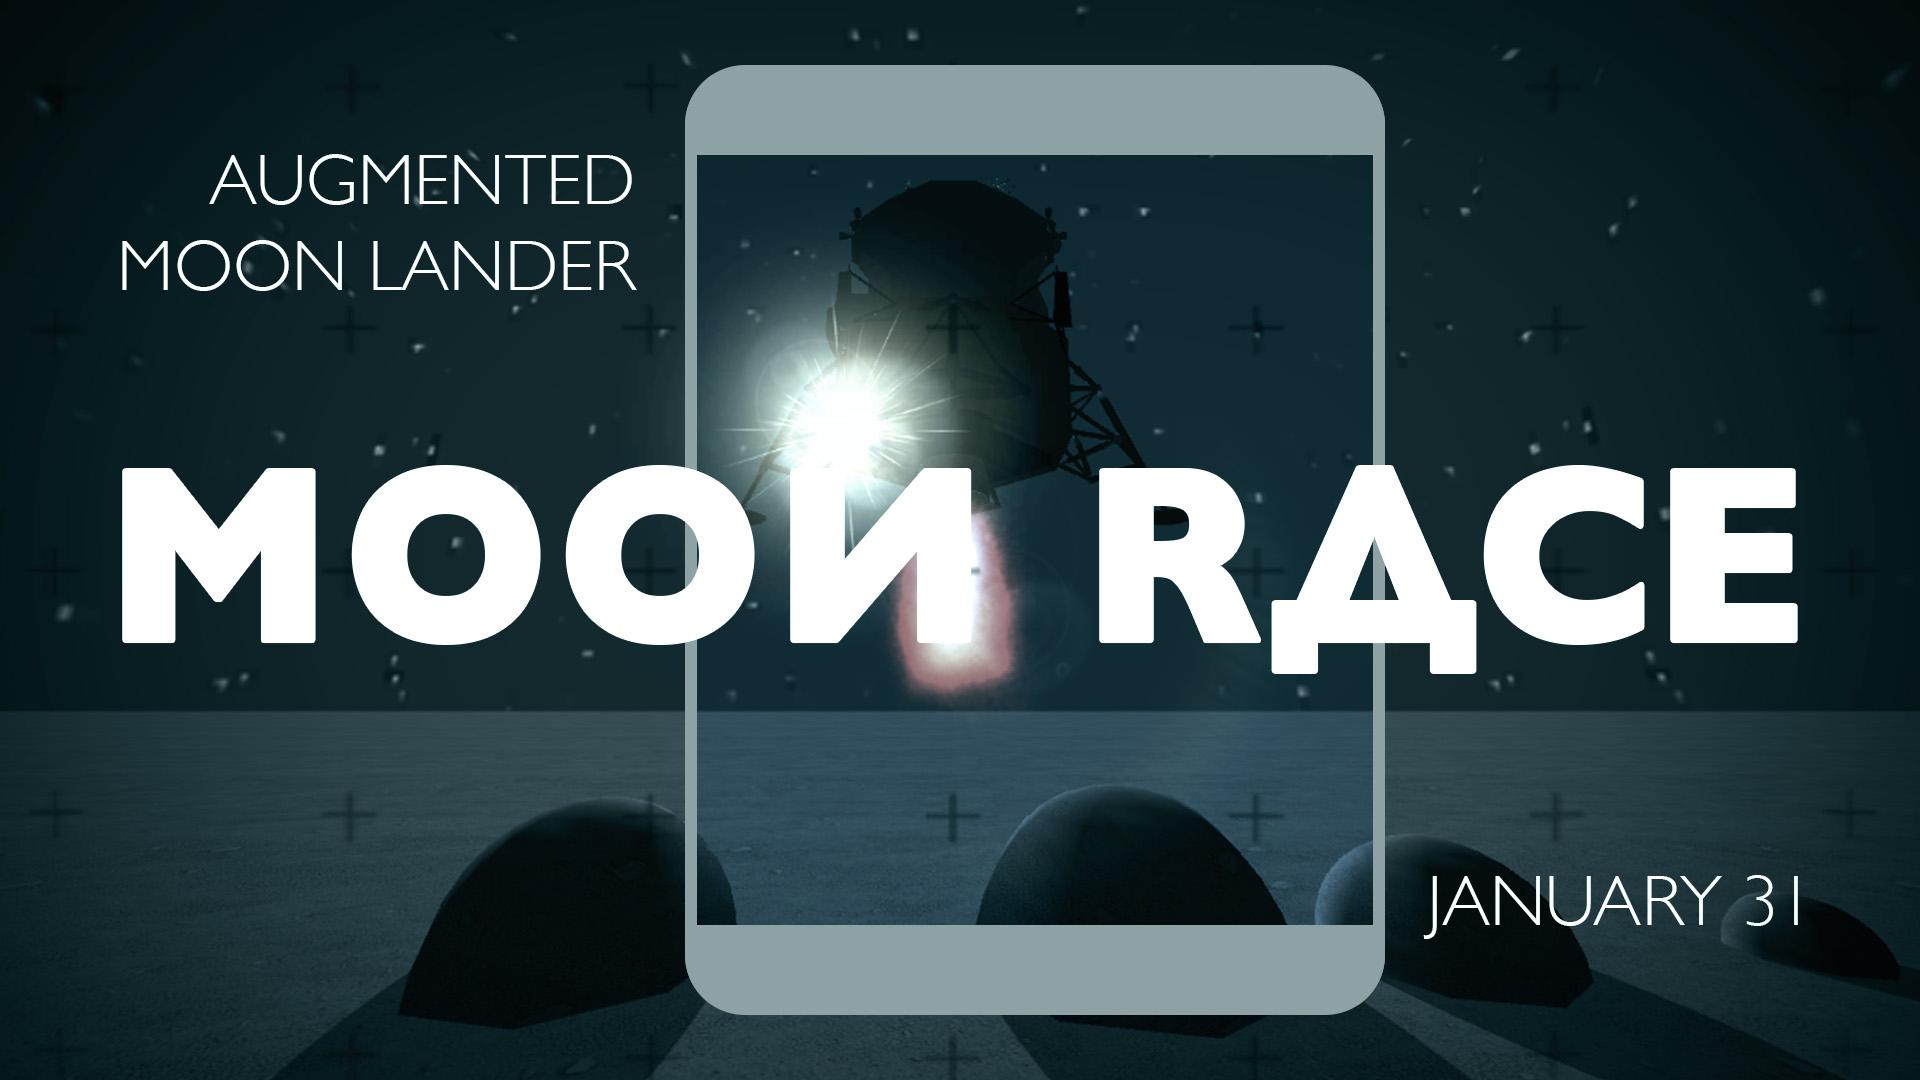 Moon Race